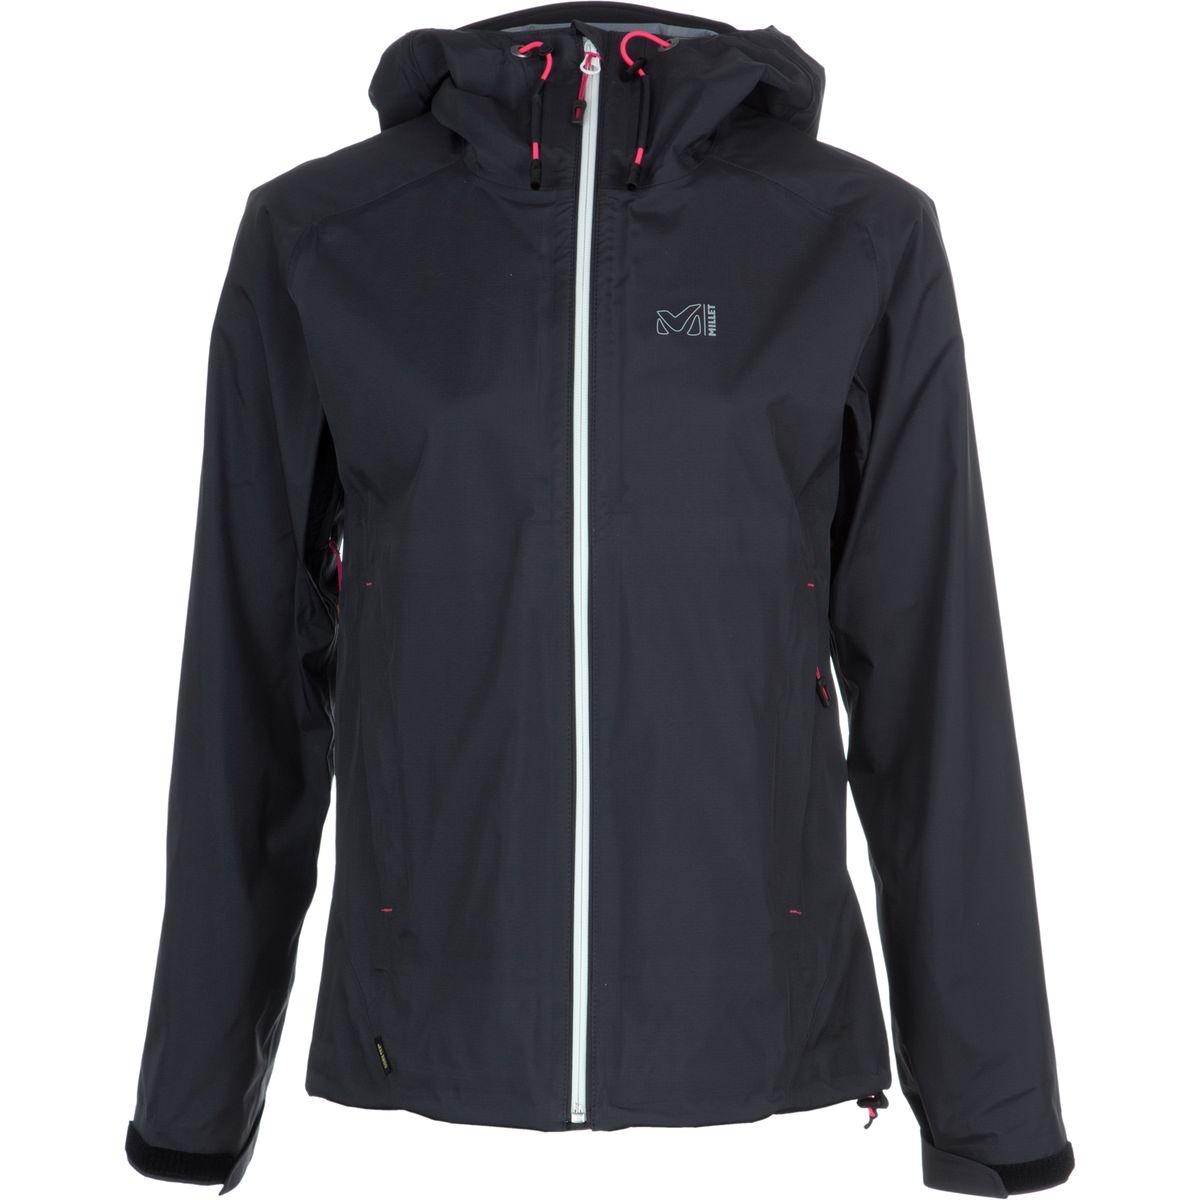 Millet Hymal Pass 3L Jacket